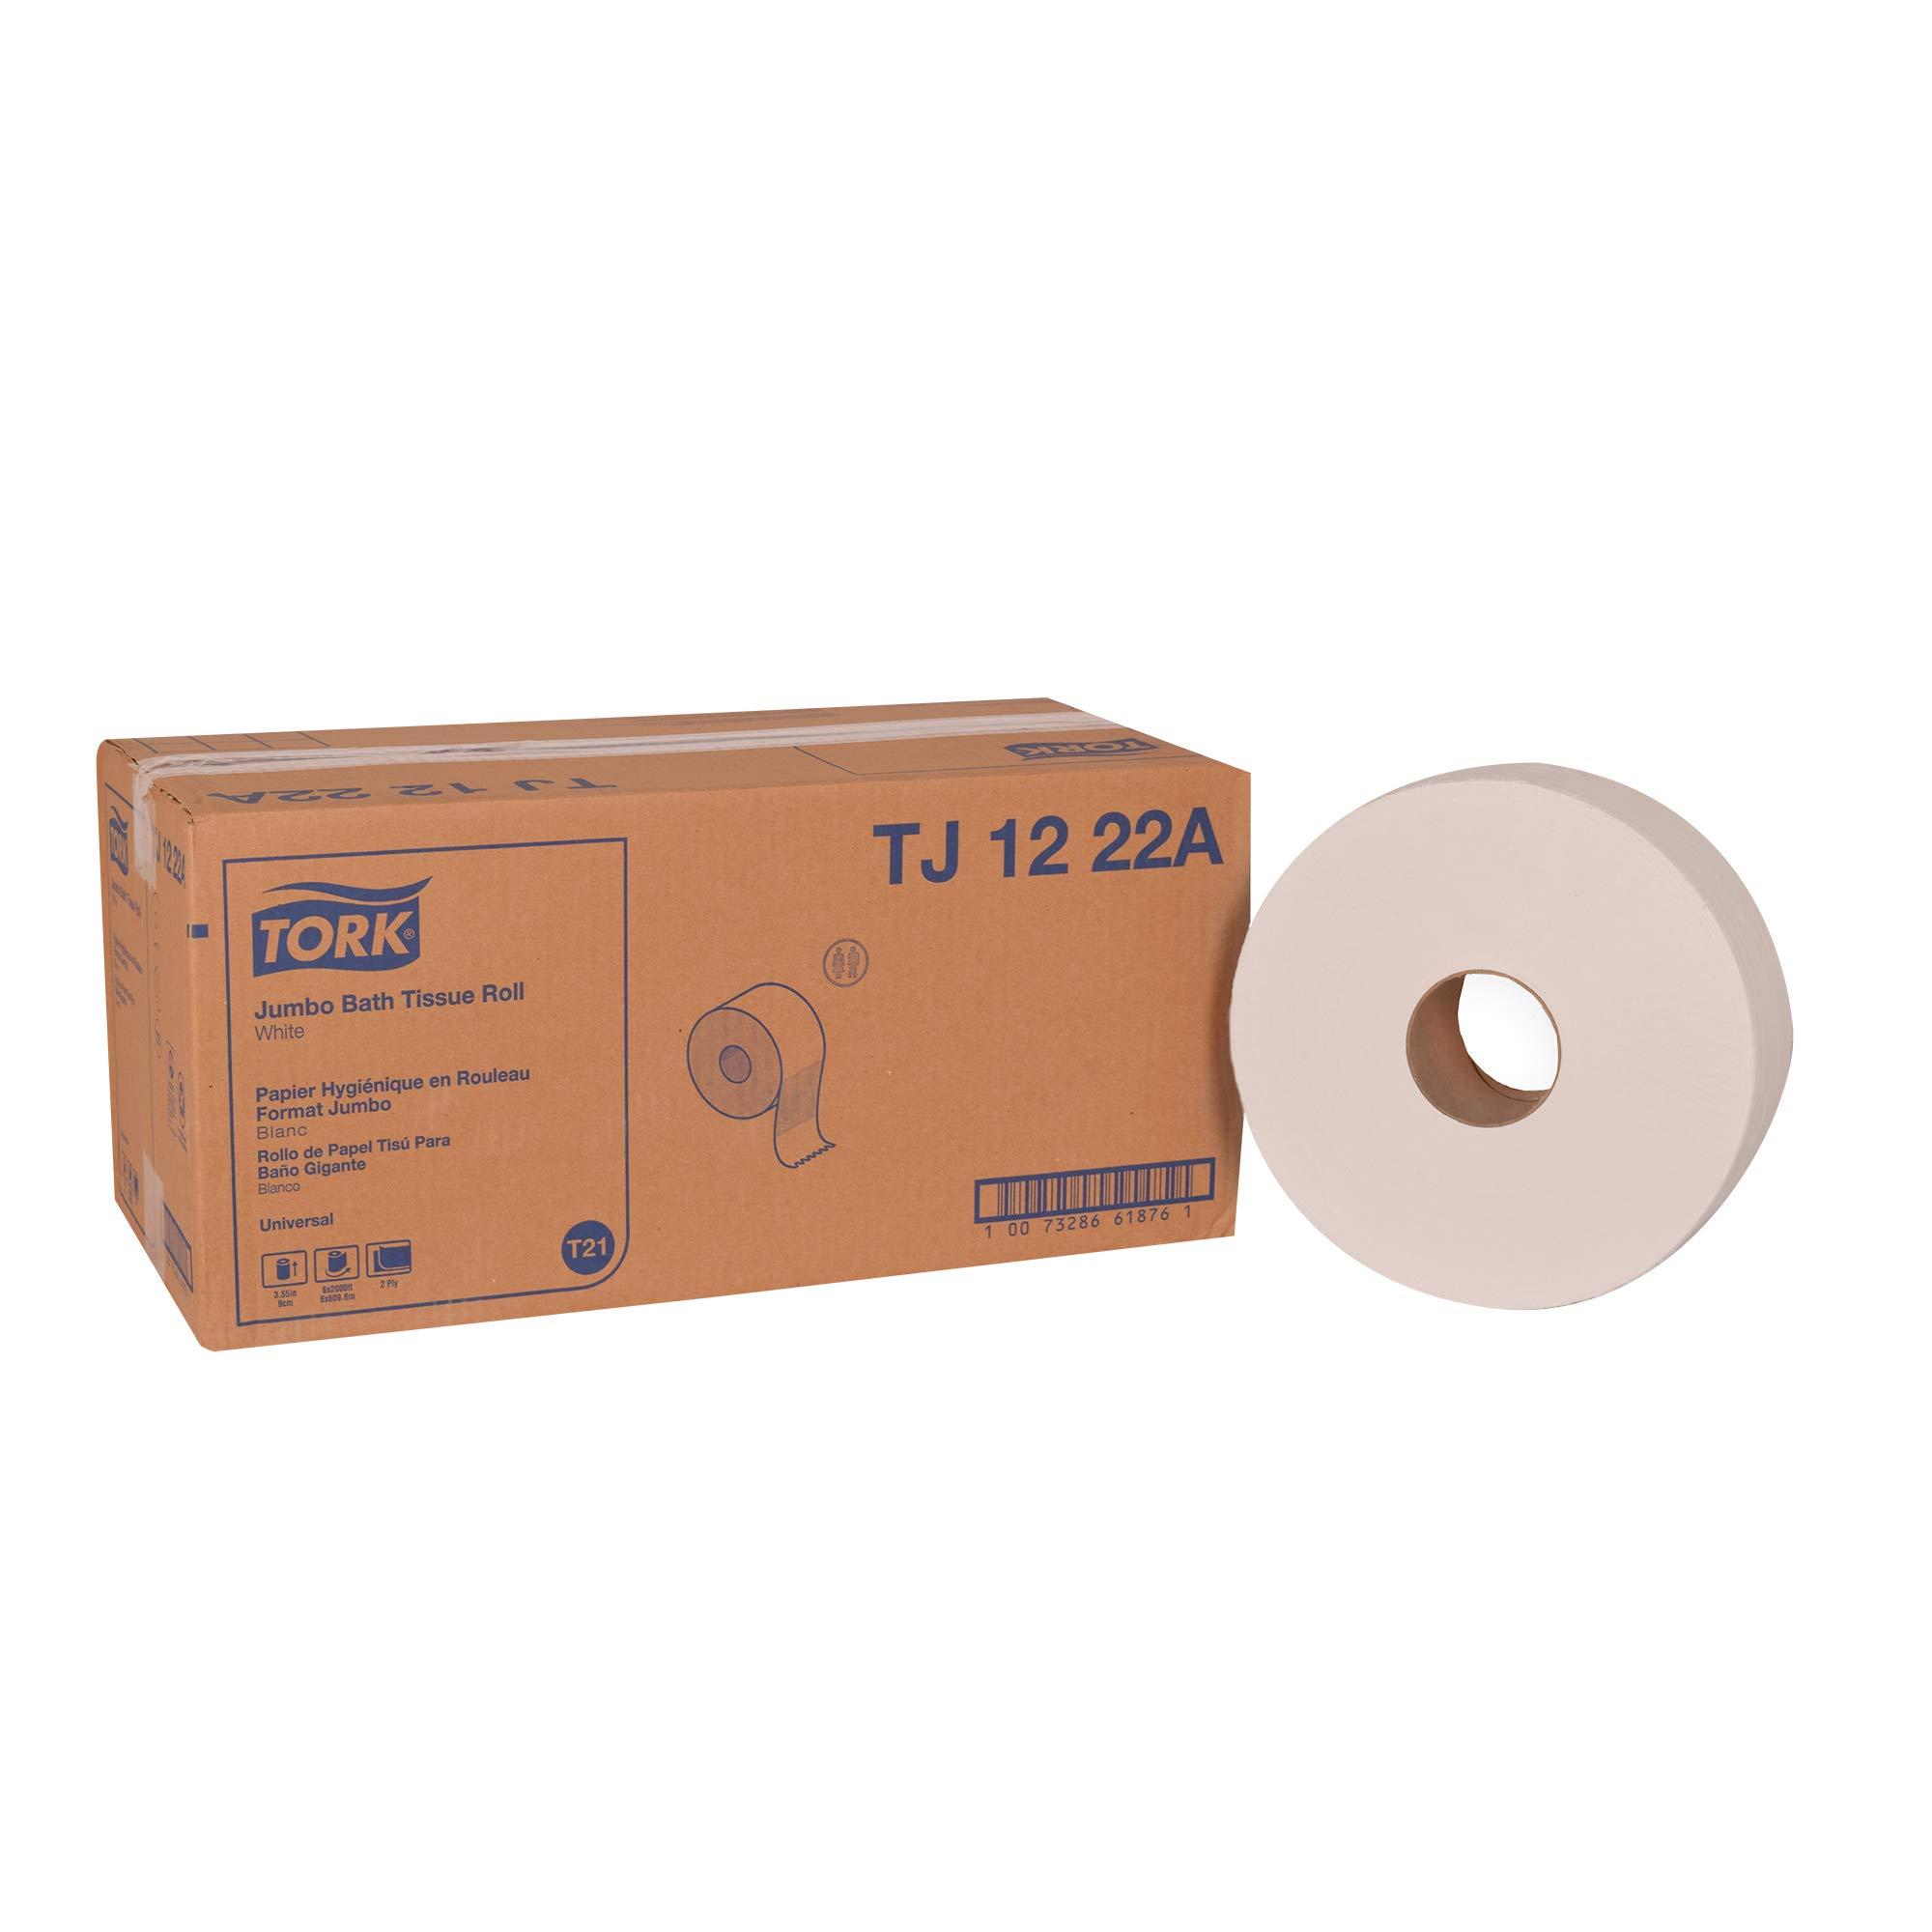 "Tork Universal TJ1222A Jumbo Bath Tissue Roll, 2-Ply, 11.75"" Dia., 3.55"" Width x 2,000' Length, White (Case of 6 Rolls, 2,000 per Roll, 12,000 Feet)"